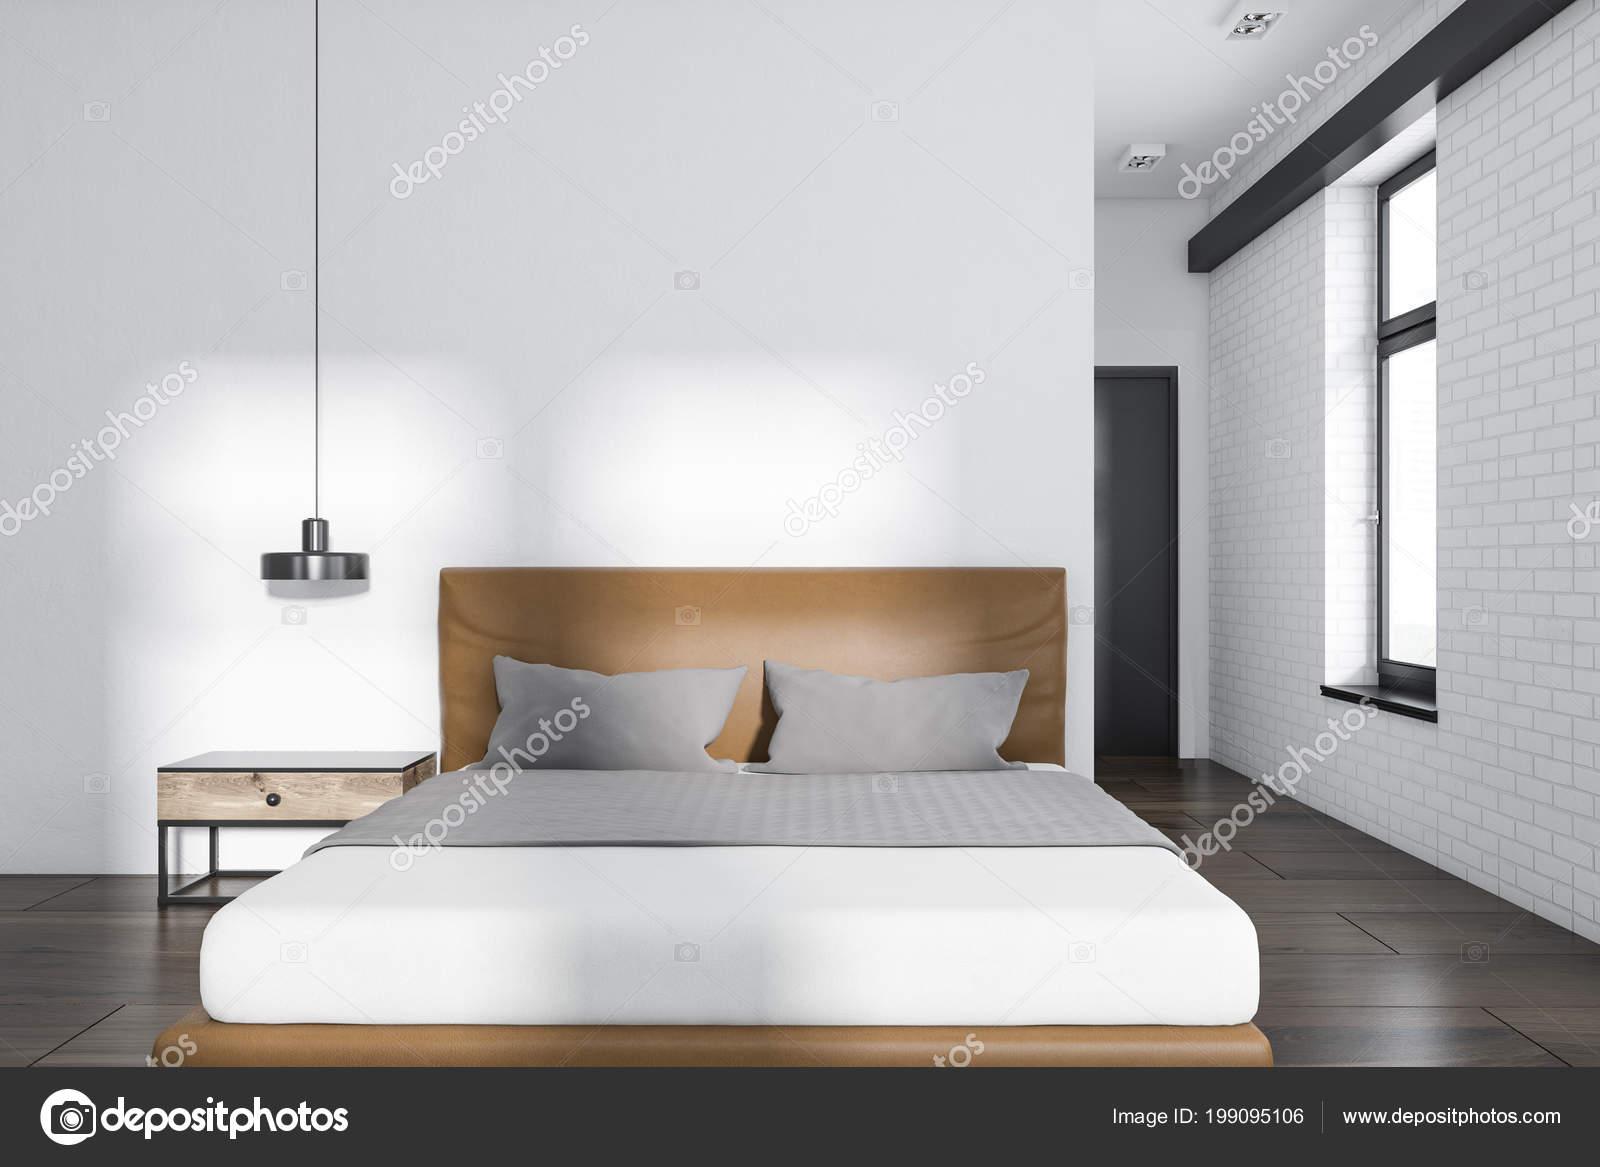 Modern Bedroom Interior White White Brick Walls Wooden Floor Double